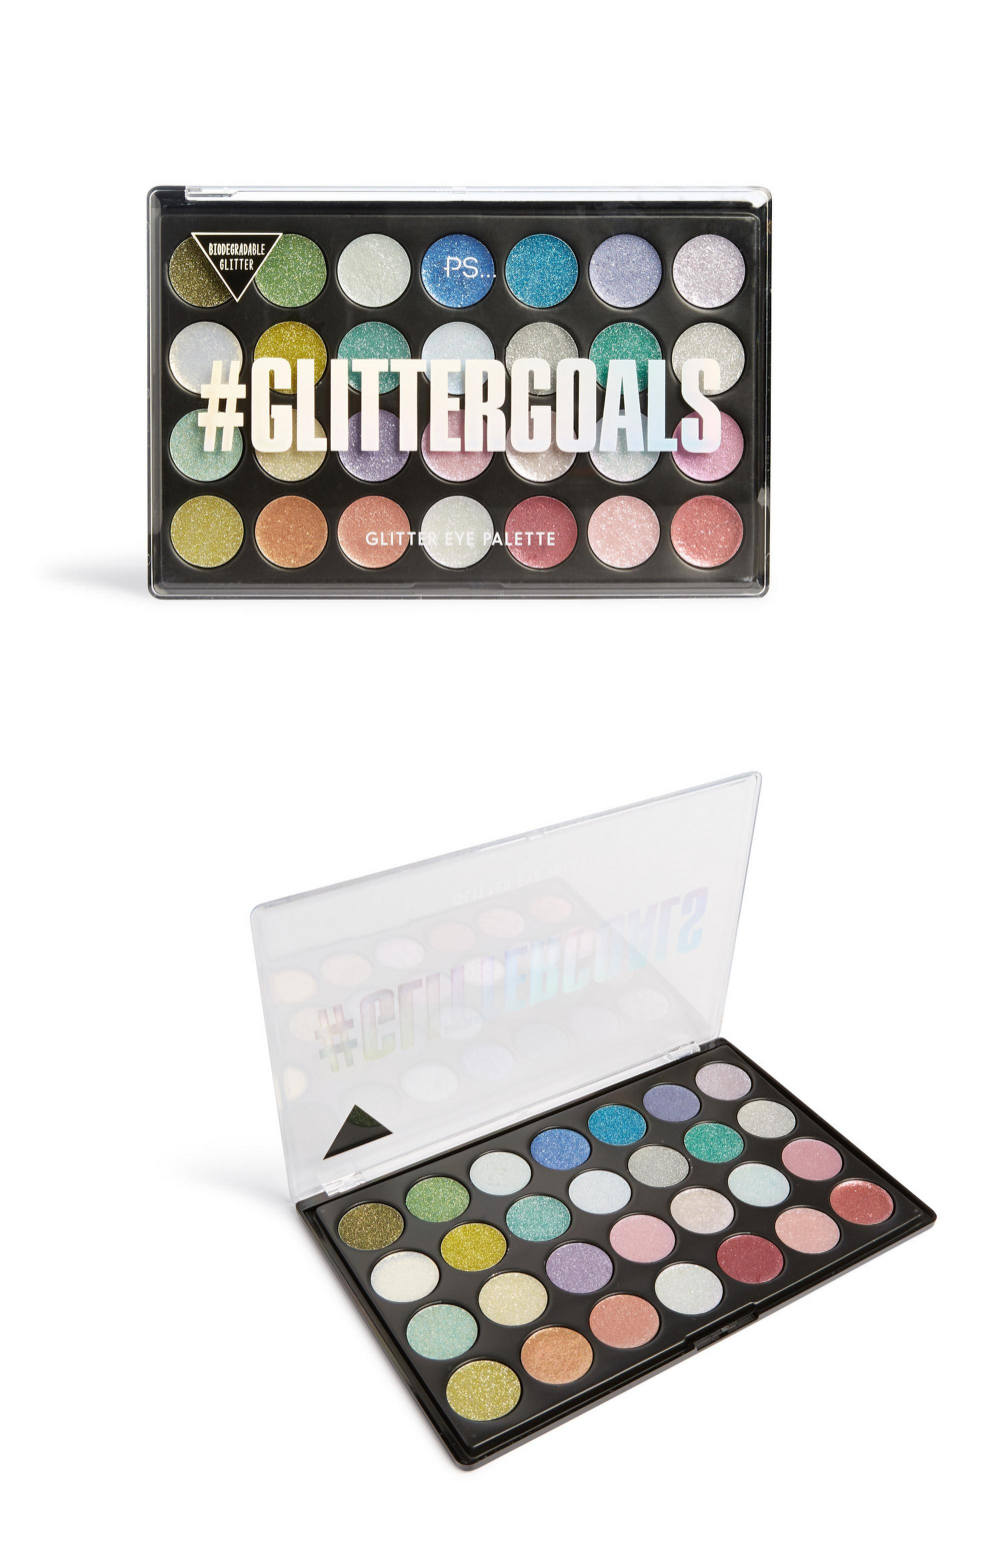 EcoFriendly Glitter Eye Palette Skin Cosmetics Make